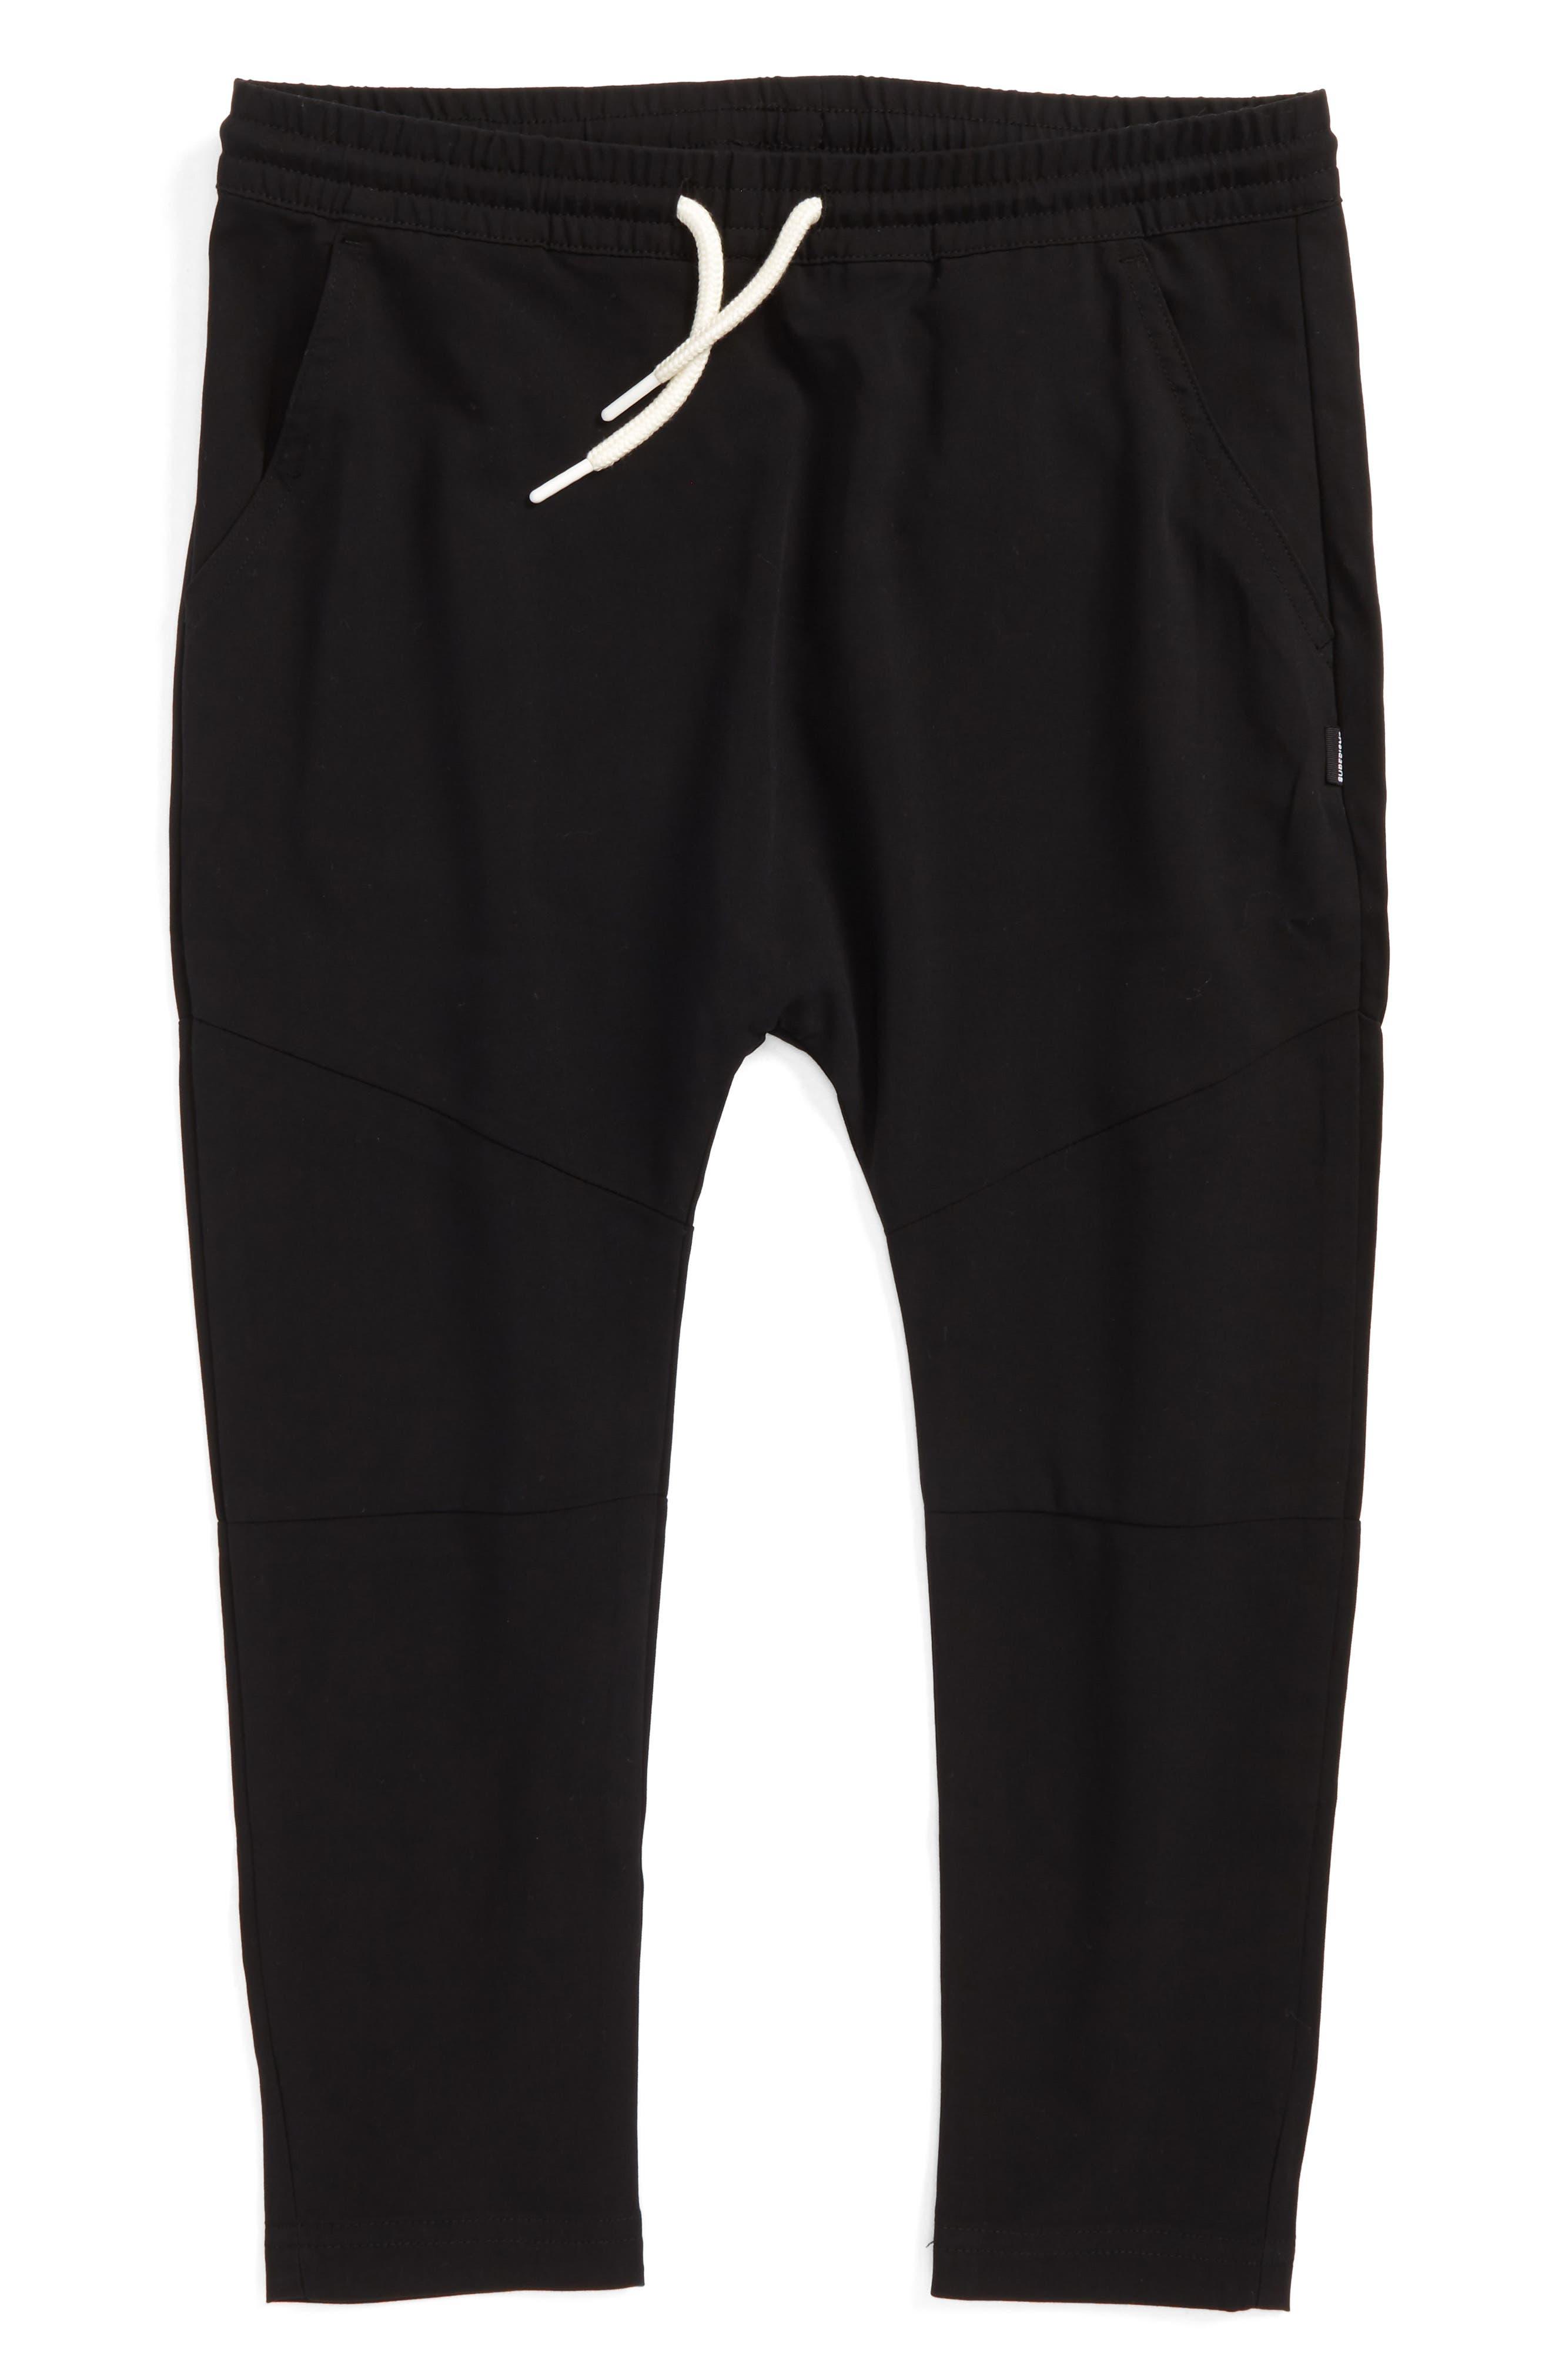 Elliot Woven Jogger Pants,                             Main thumbnail 1, color,                             Black